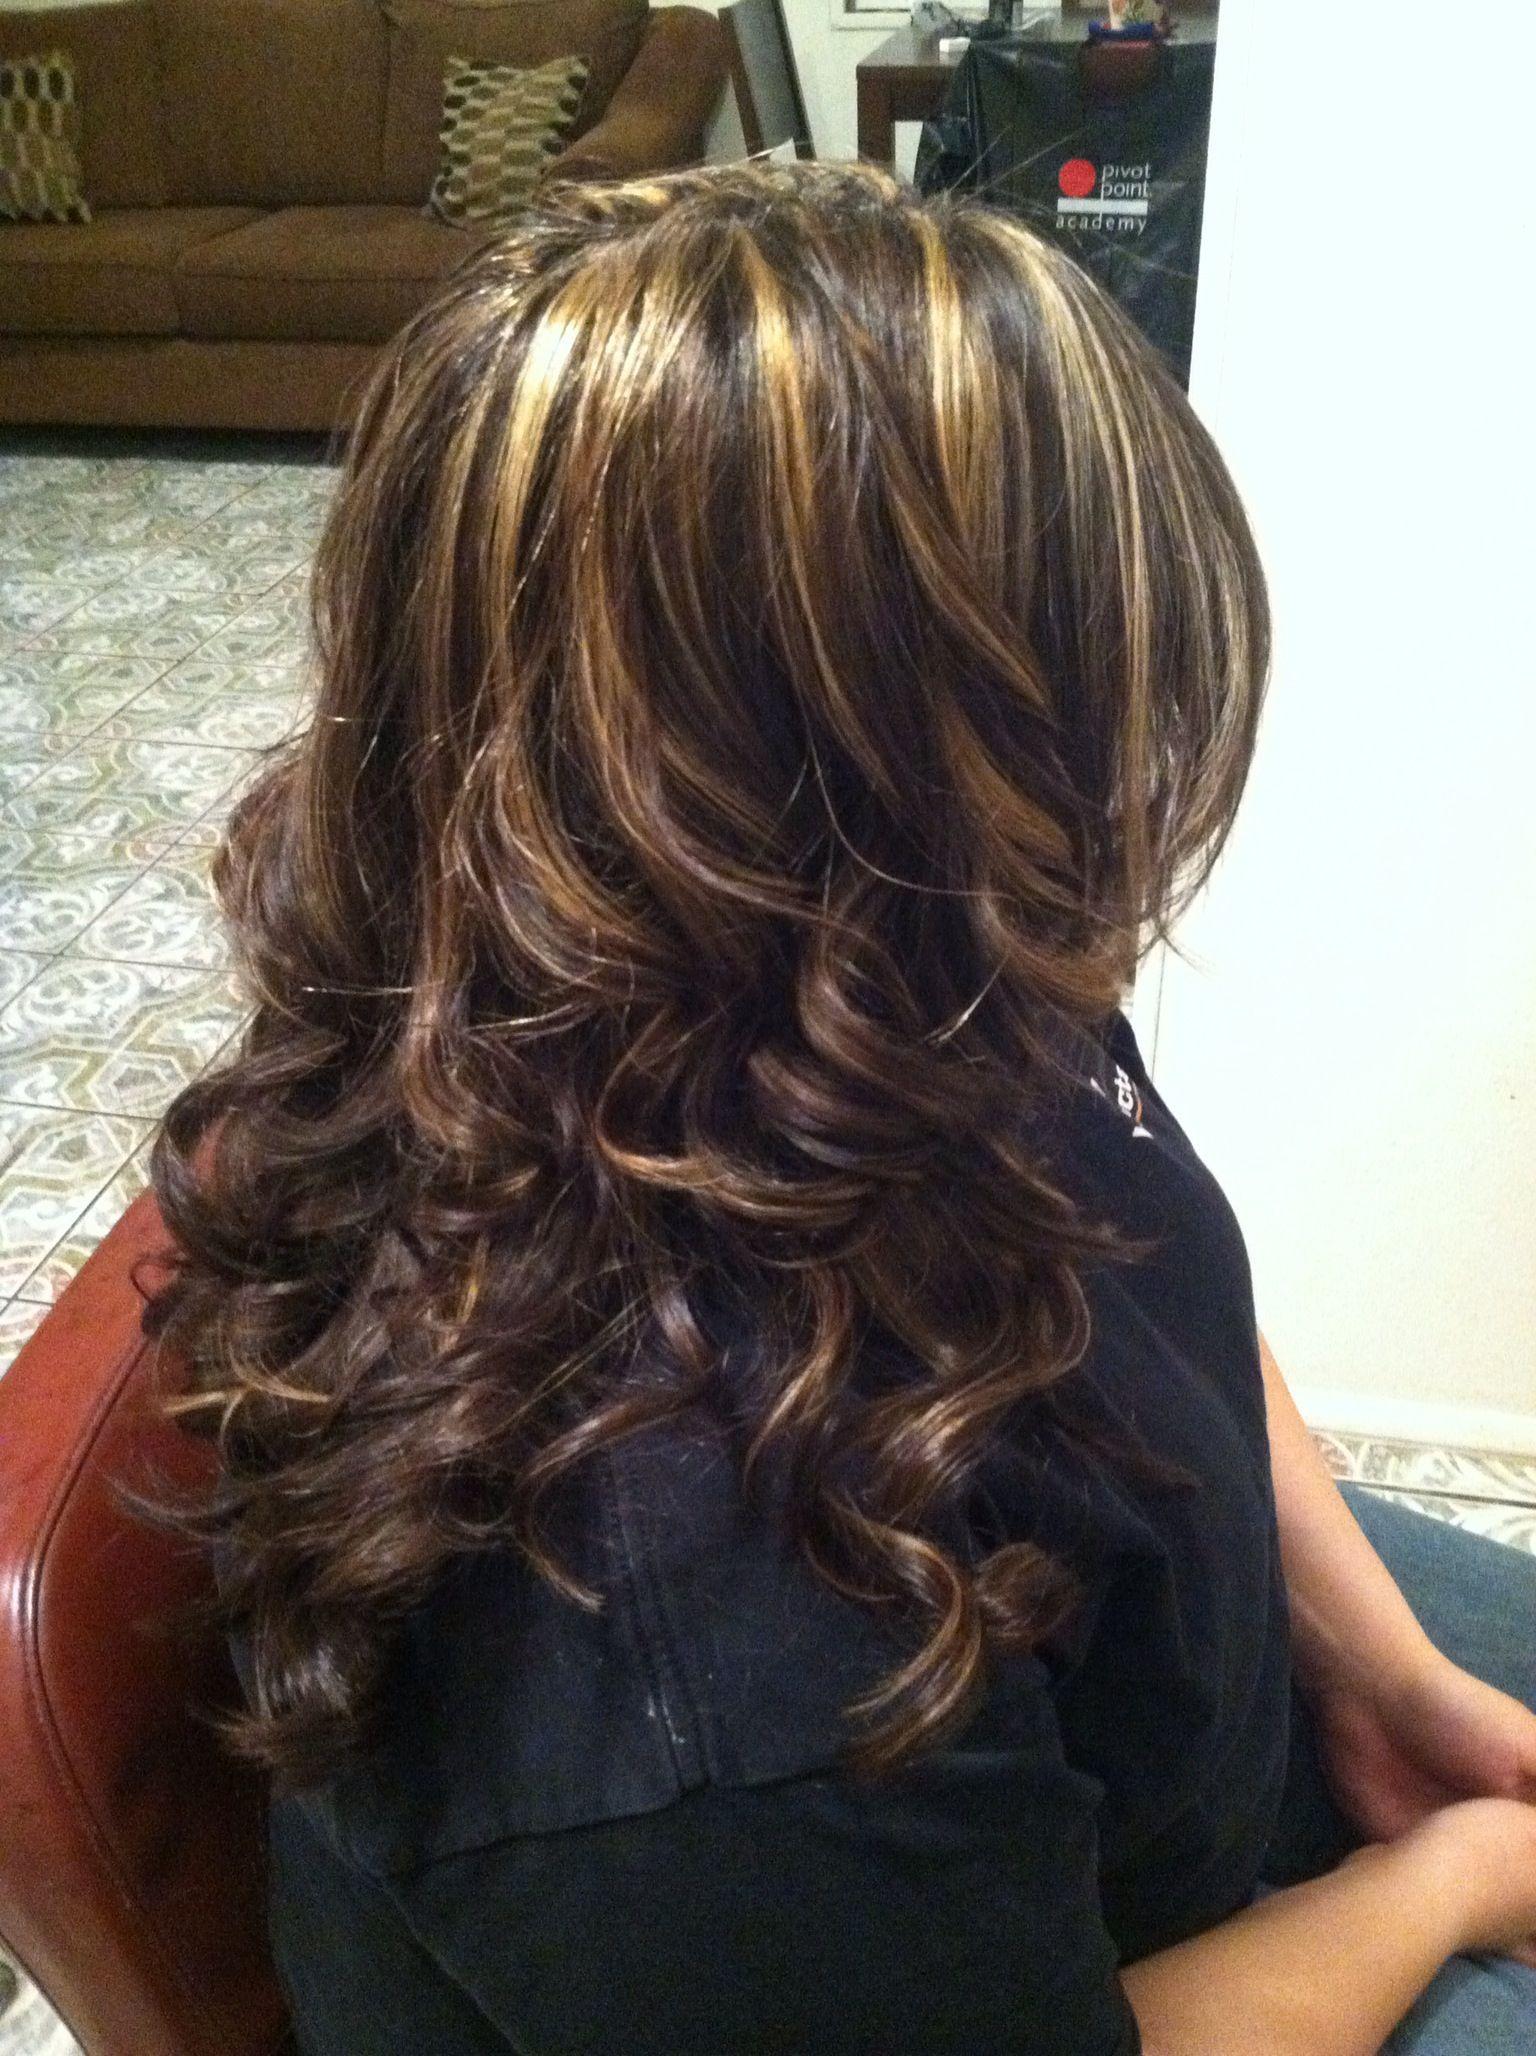 Brown hair caramel highlights | Hair and makeup | Pinterest